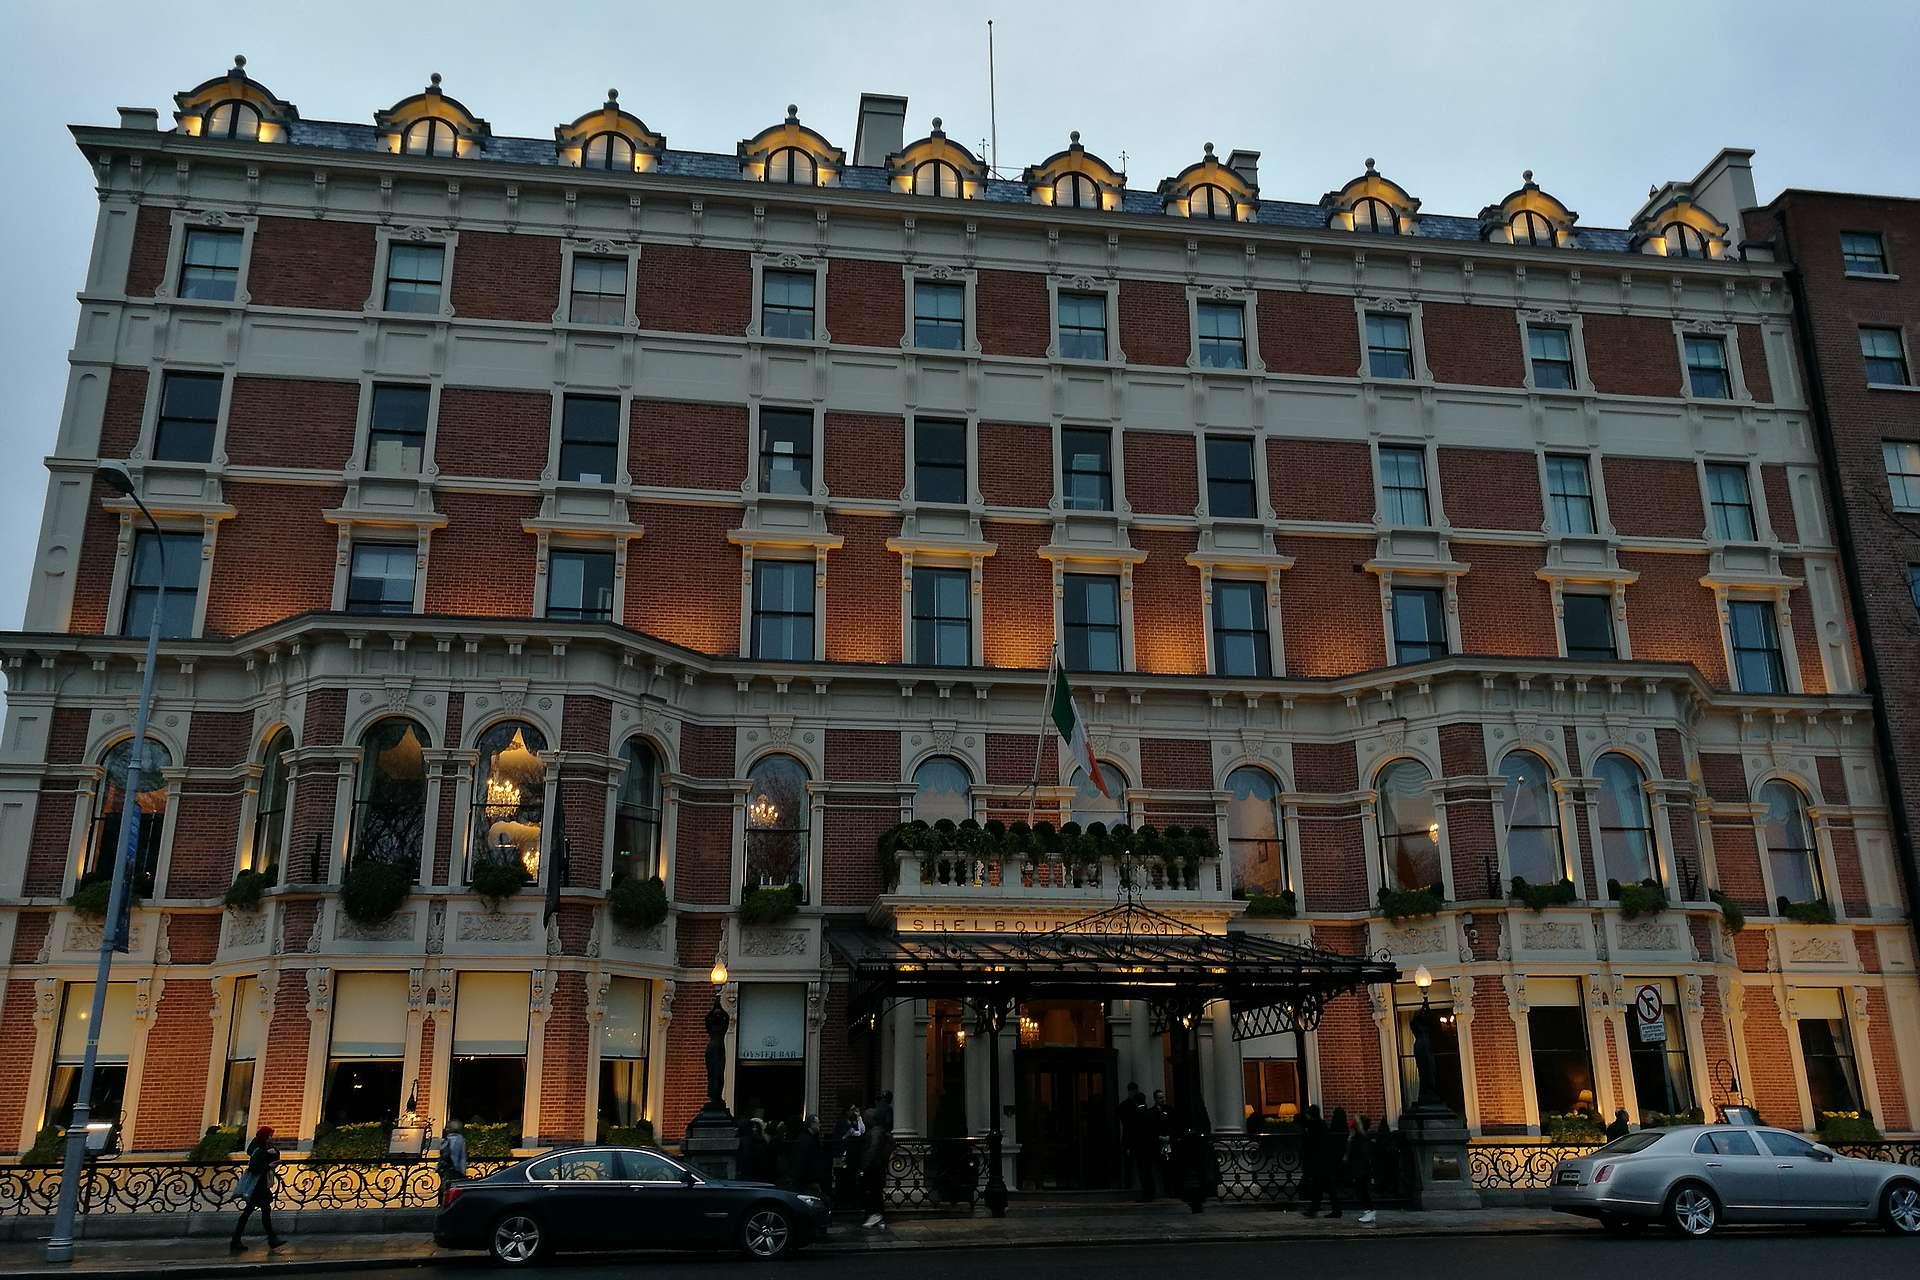 Dublin - The Shelbourne hotel